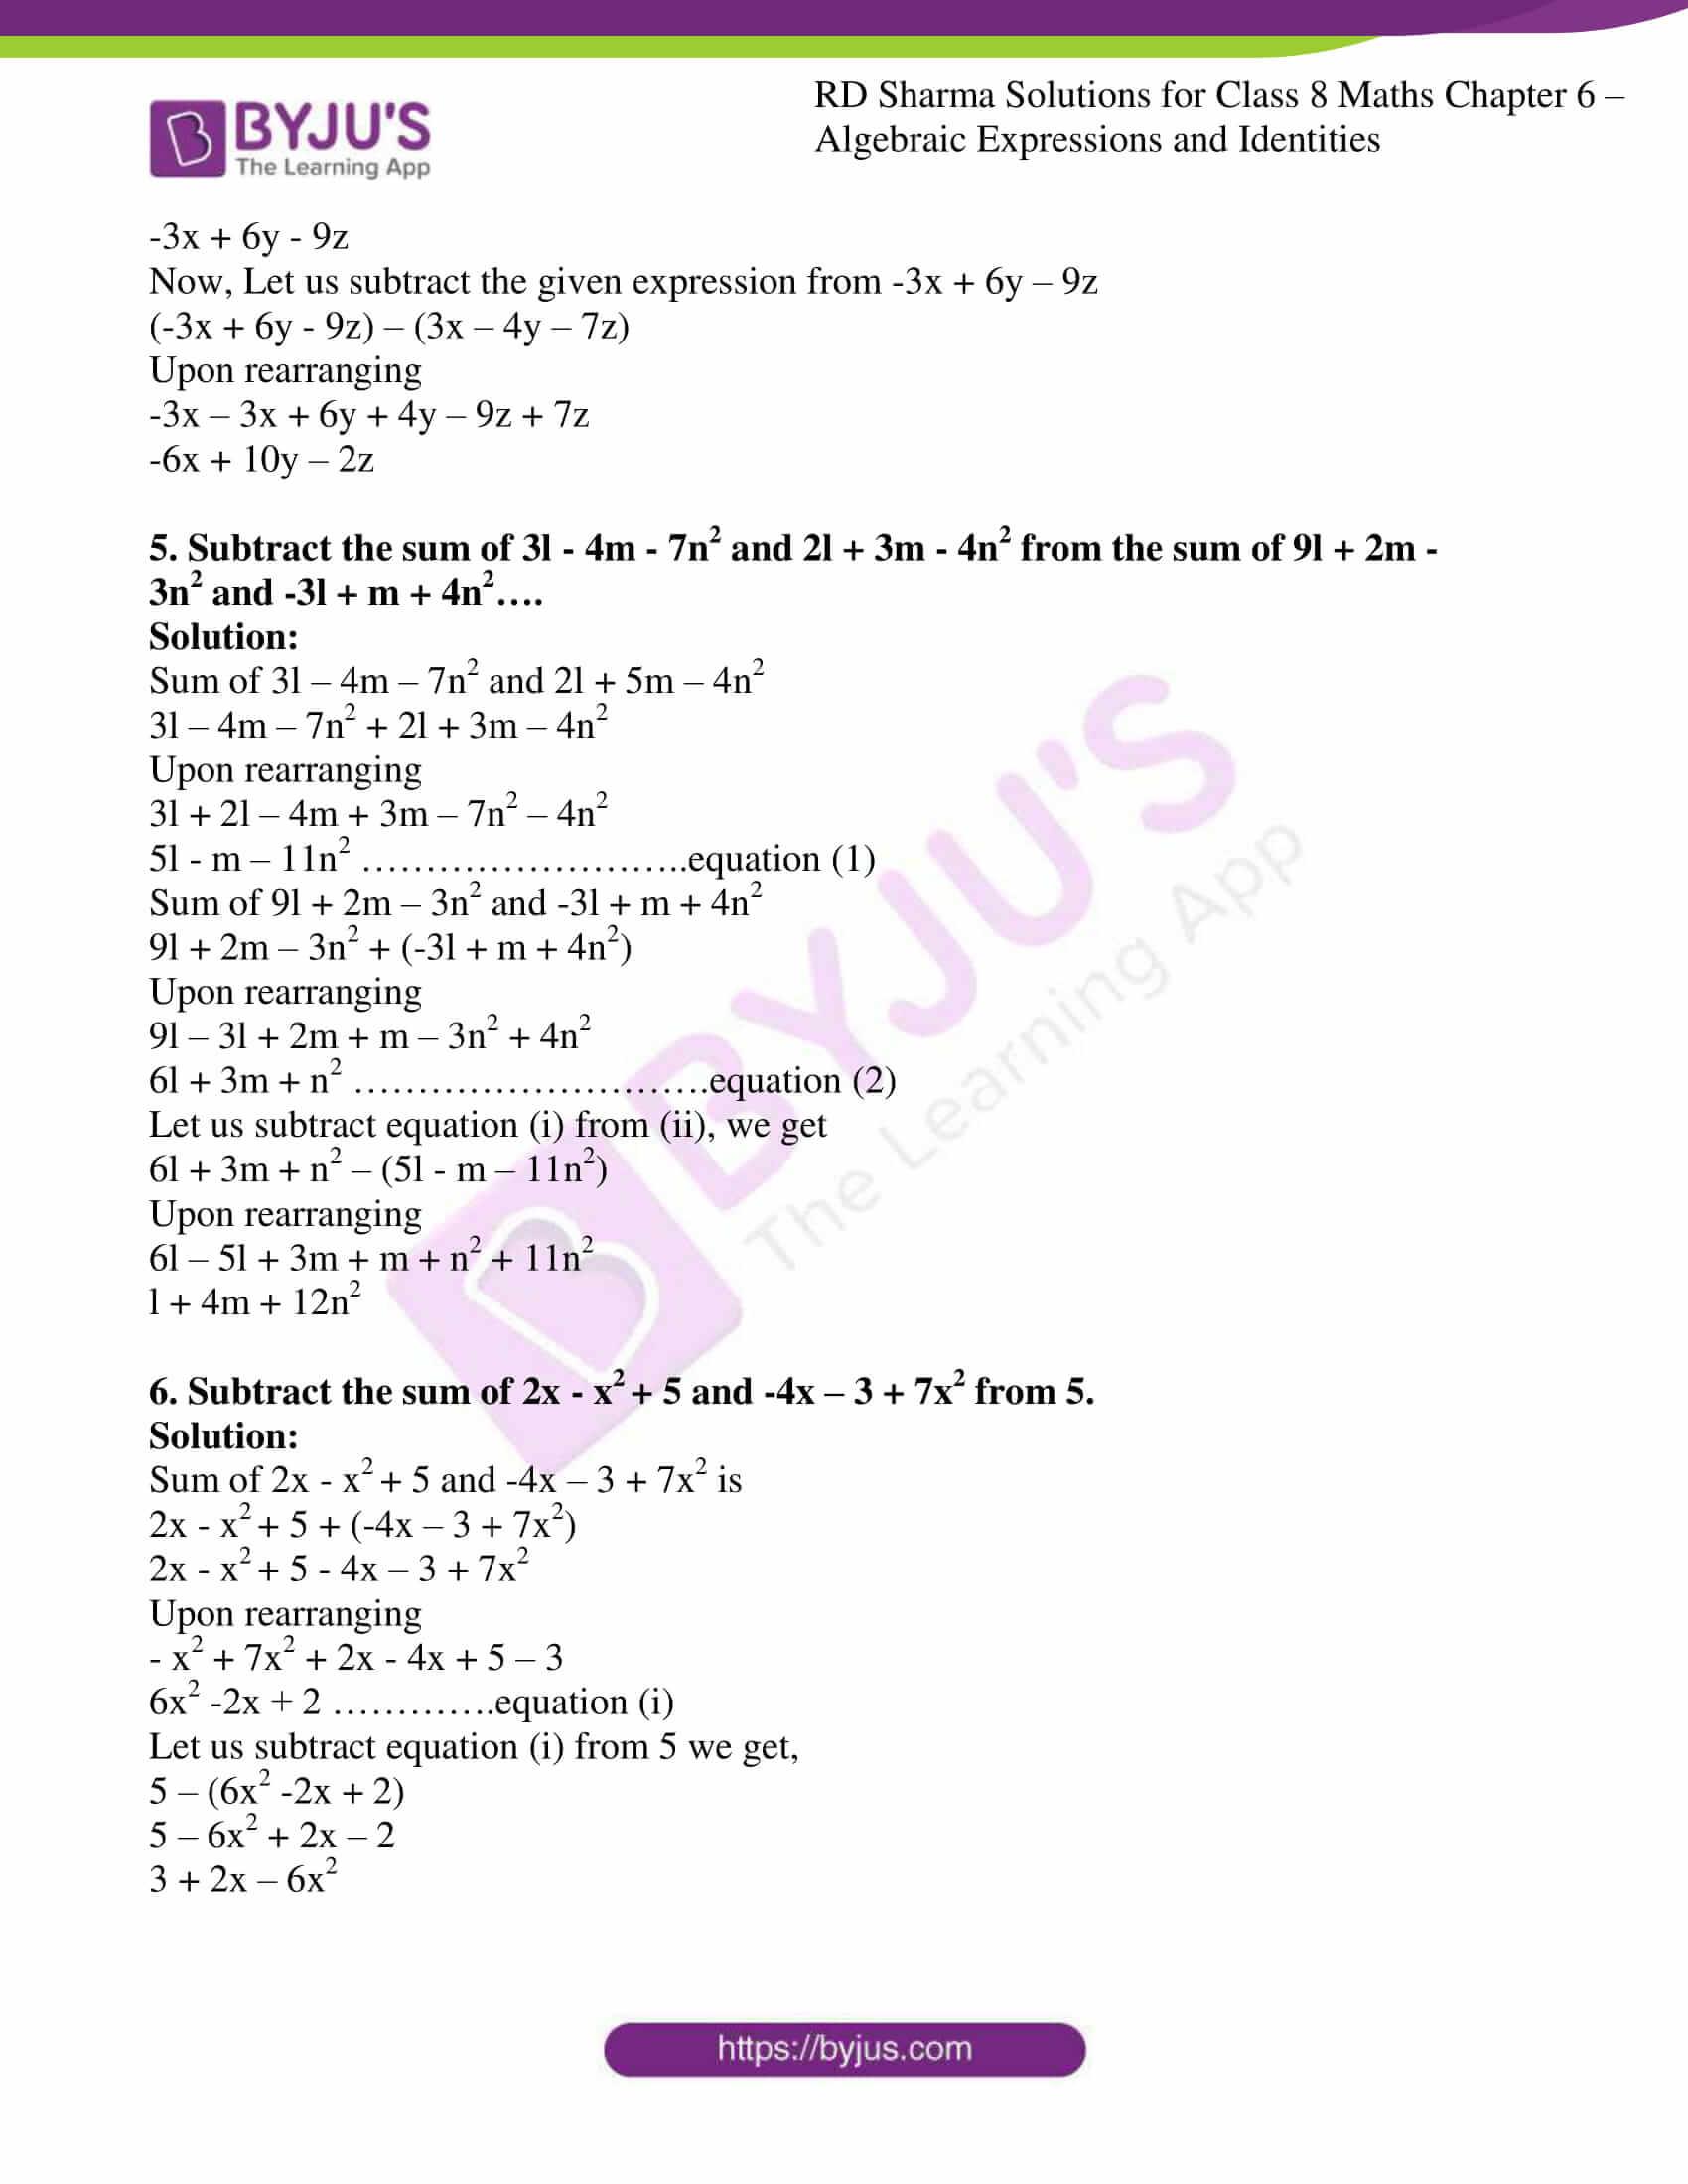 rd sharma class 8 maths chapter 6 exercise 2 6